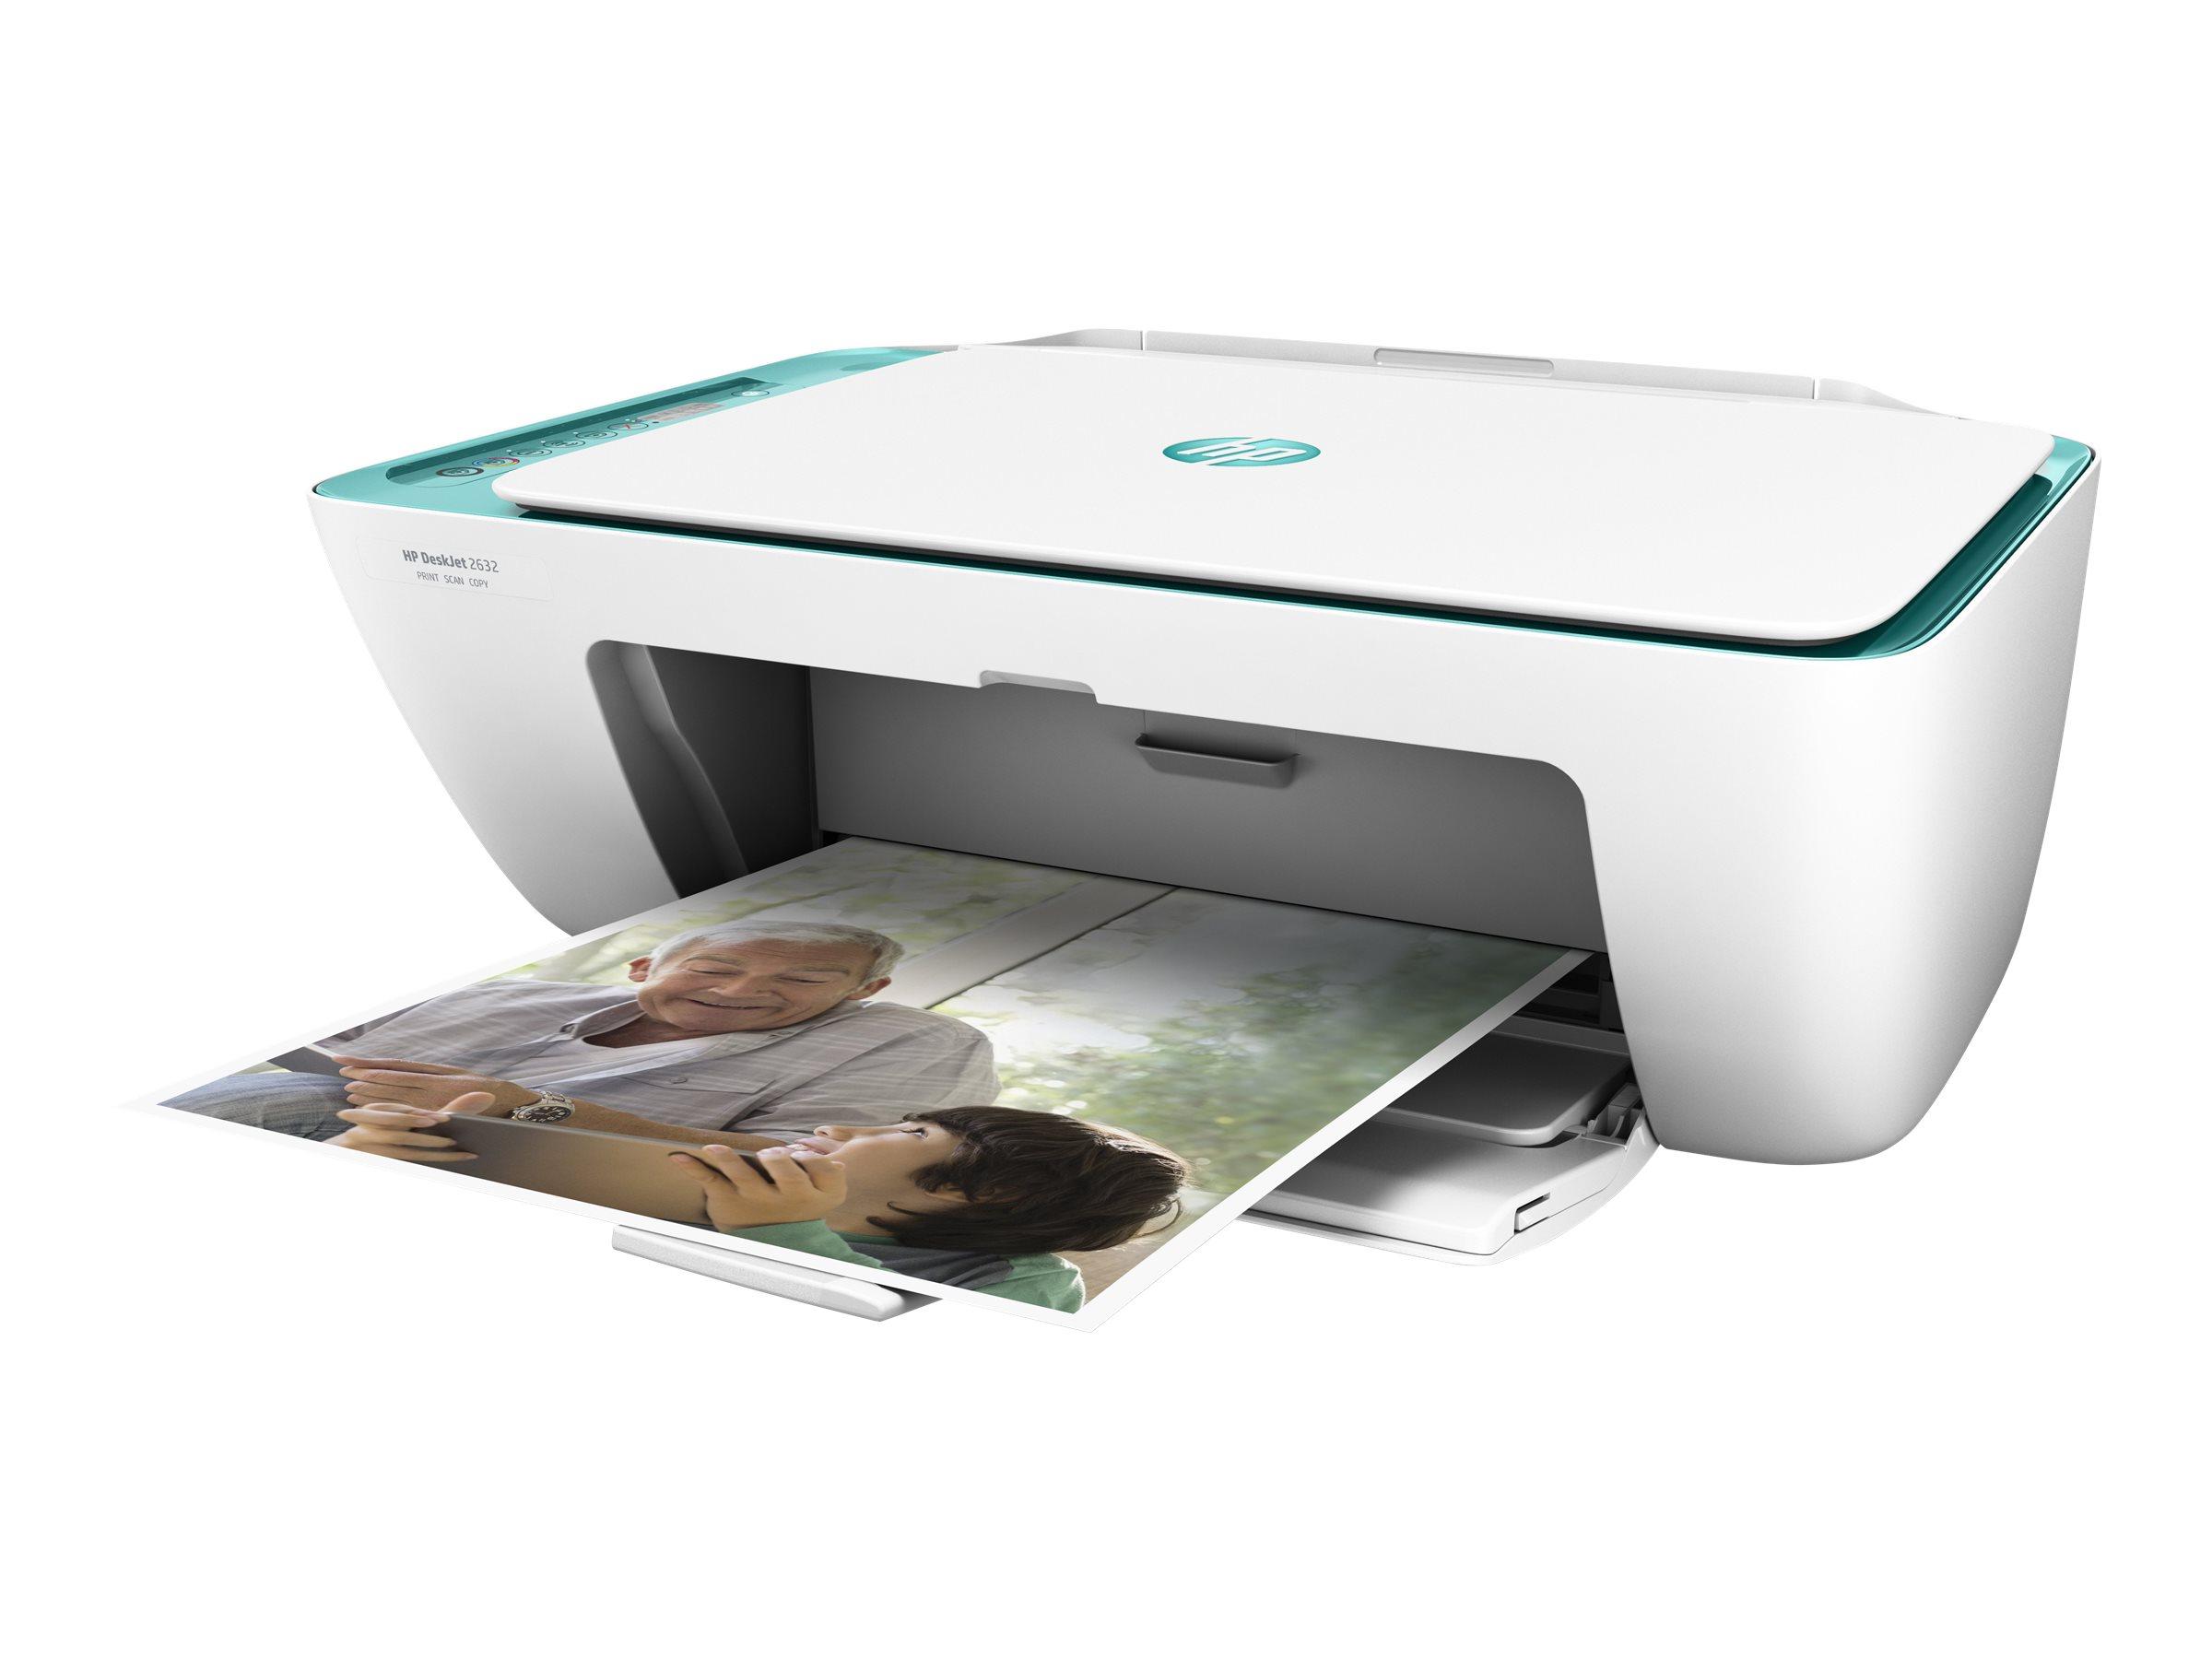 HP Deskjet 2632 All-in-One - Multifunktionsdrucker - Farbe - Tintenstrahl - 216 x 297 mm (Original)